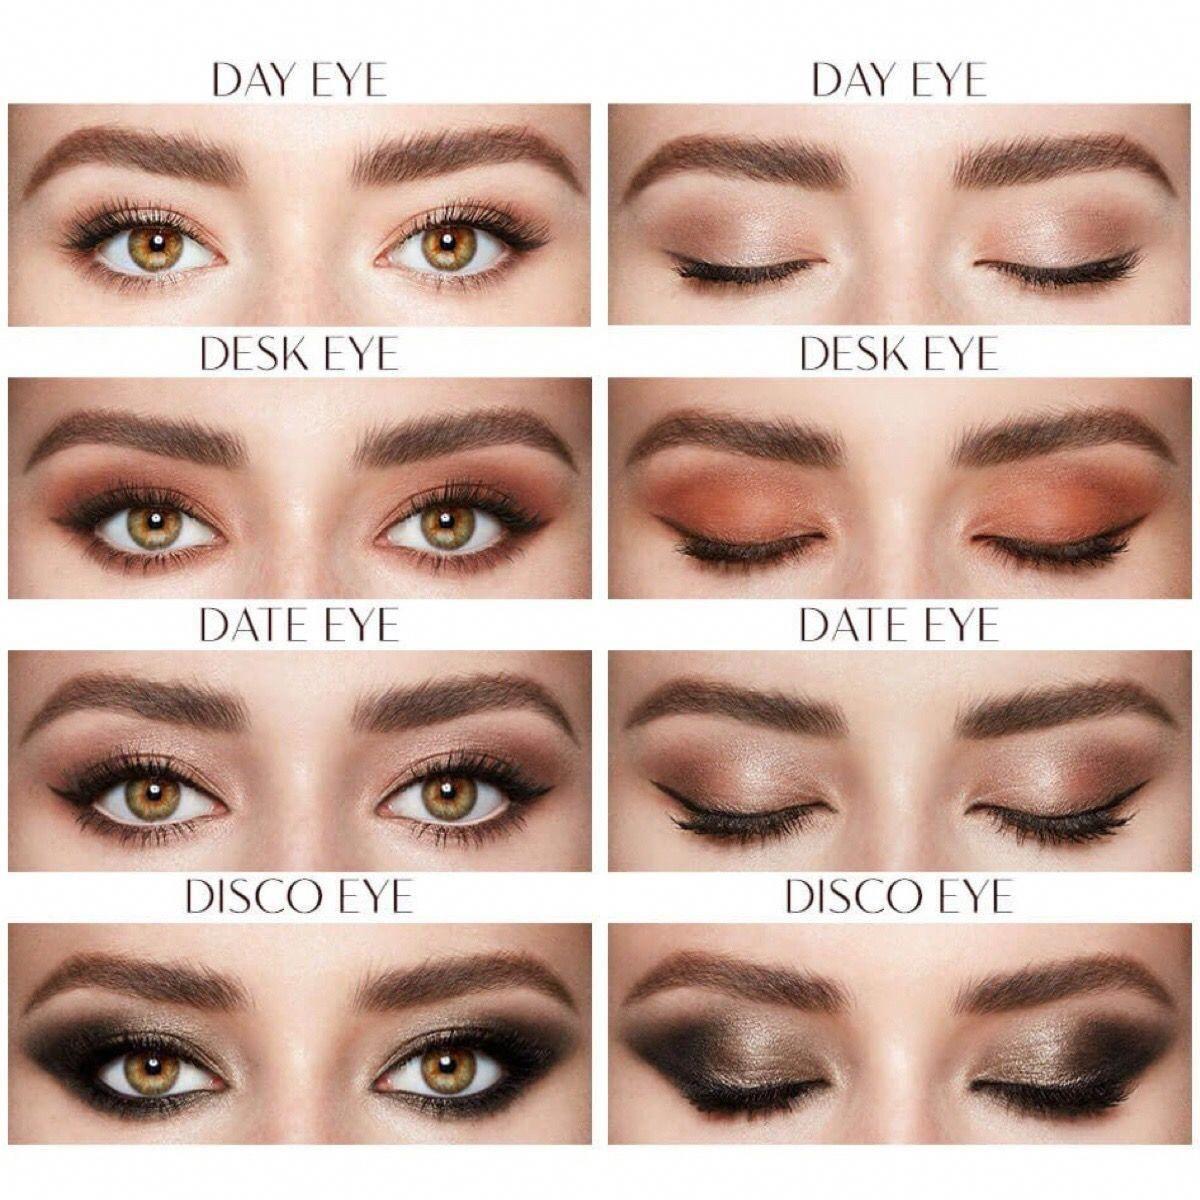 Best Eye Makeup Hacks Naturaleyemakeup Makeup Everyday Eye In 2020